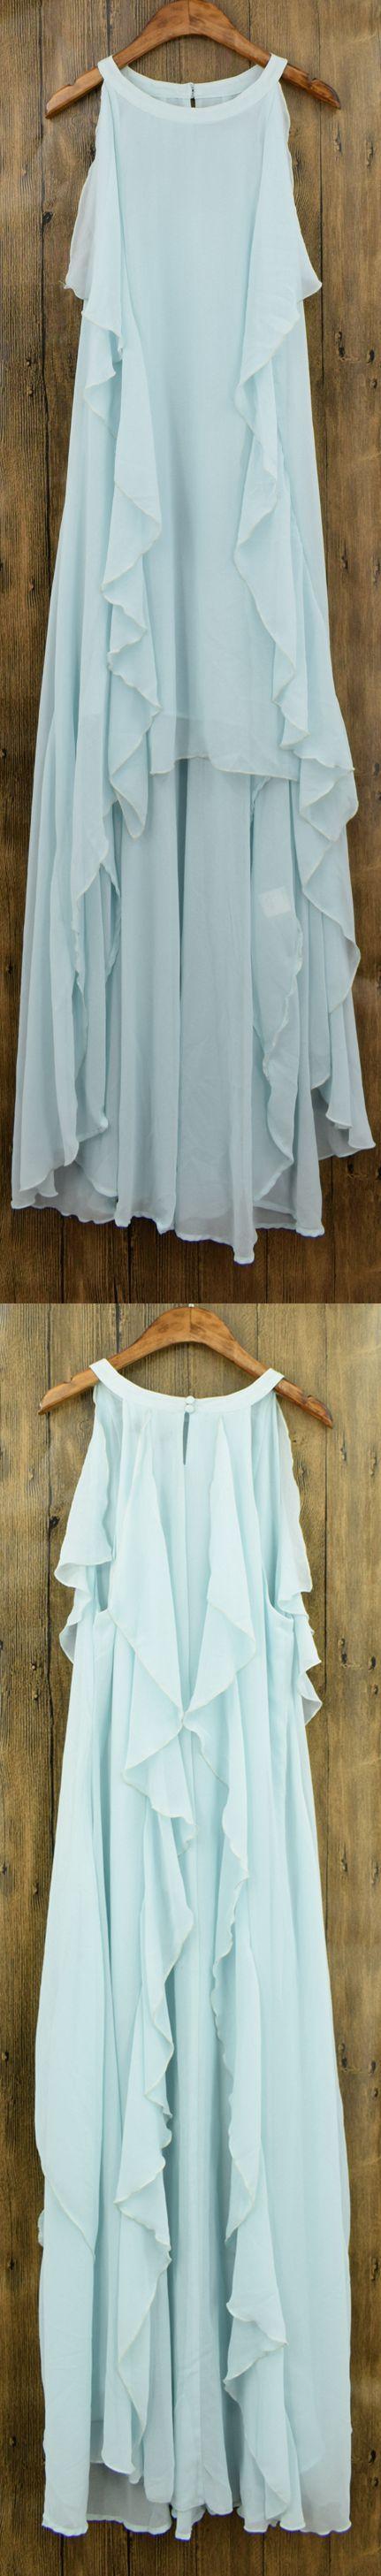 ACHICGIRL Women's Flounce Decor Sleeveless Asymmetric Chiffon Dress